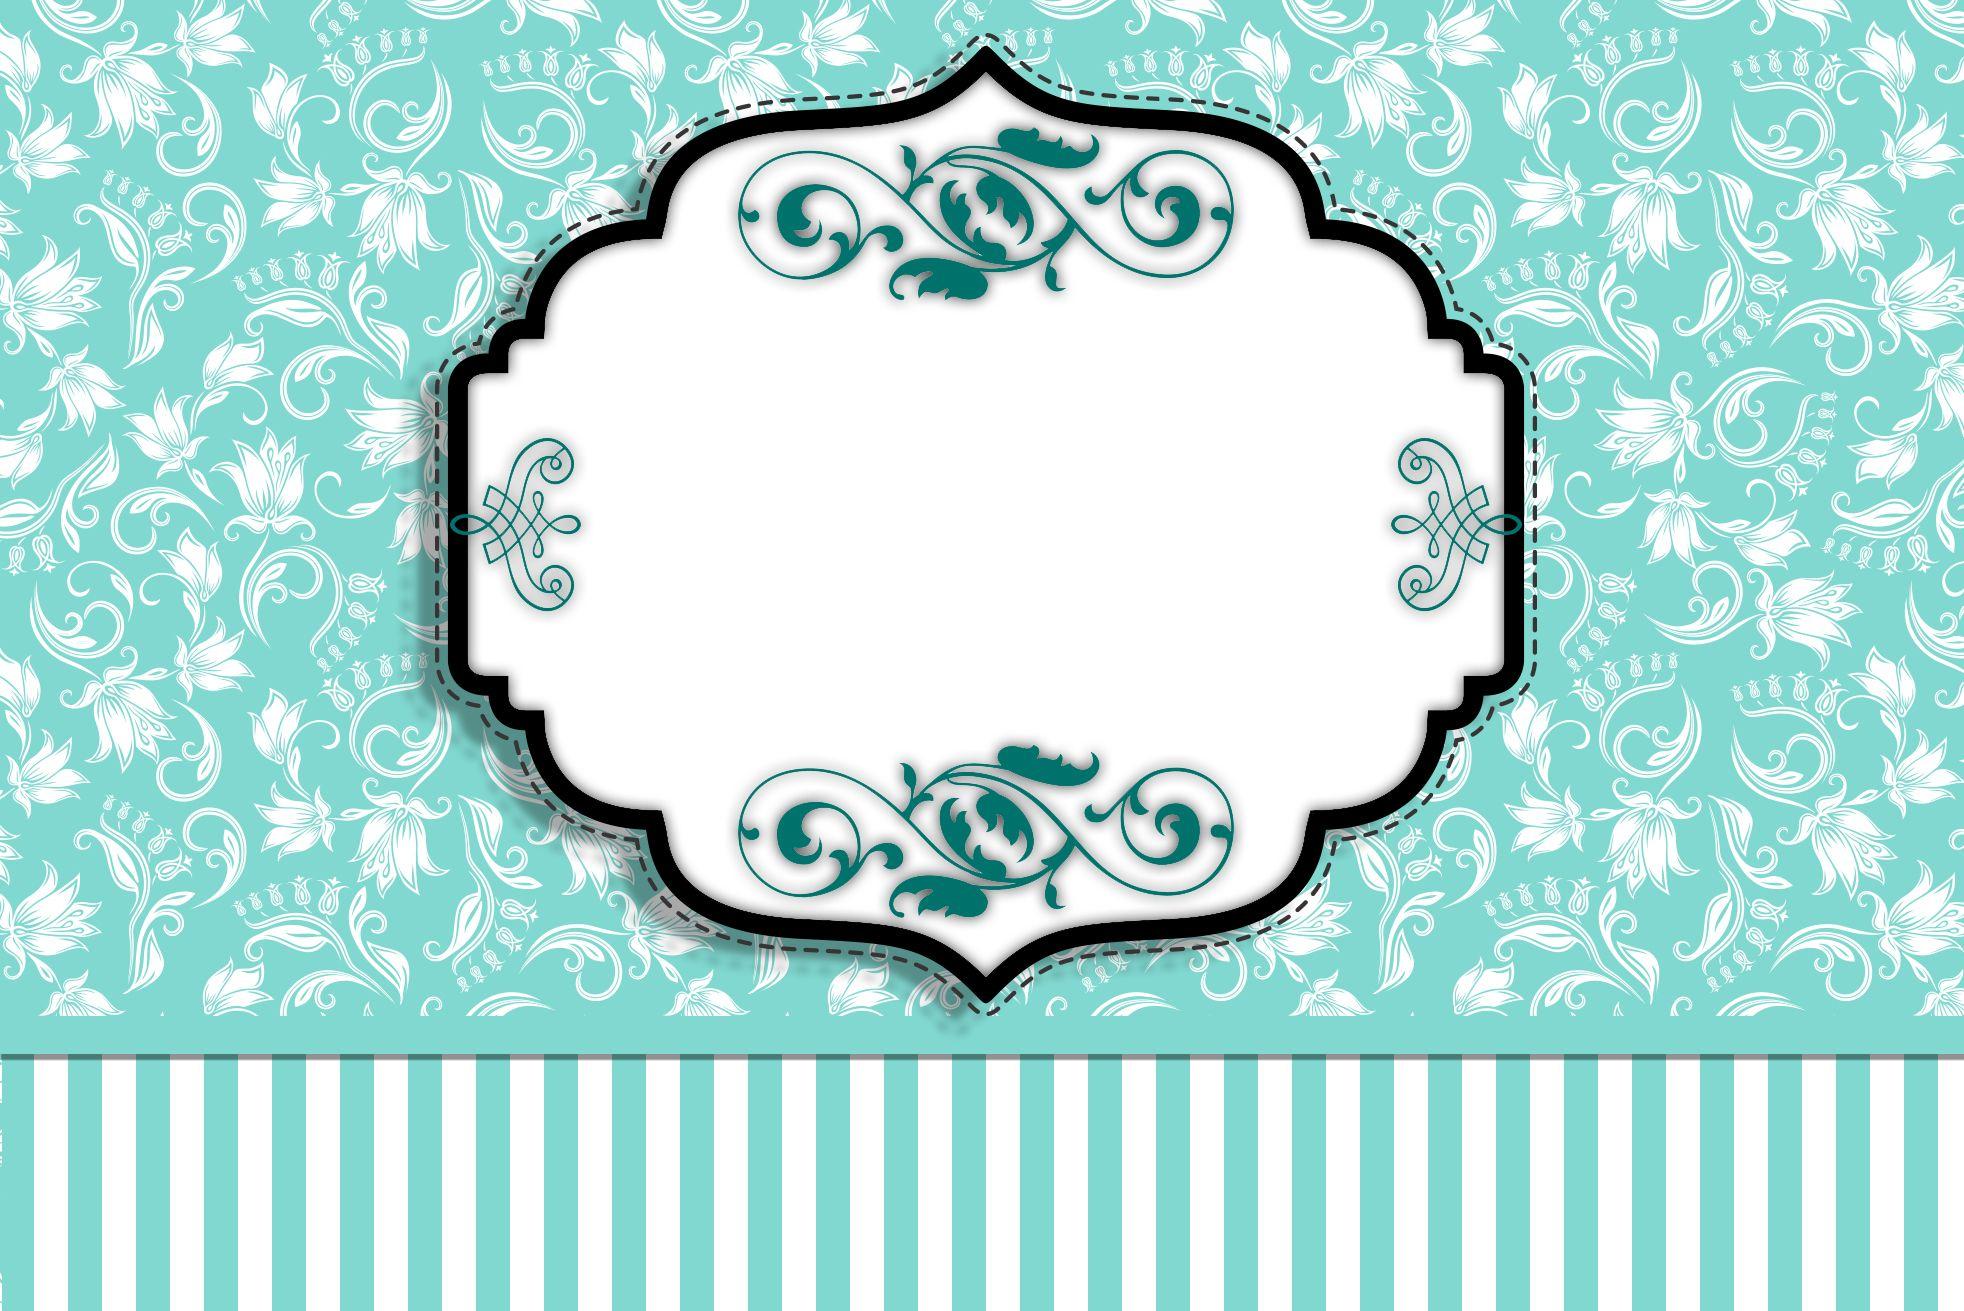 Kit Completo Azul Tiffany Floral e Listras!   Kit s para Festas ... cf8fec236c